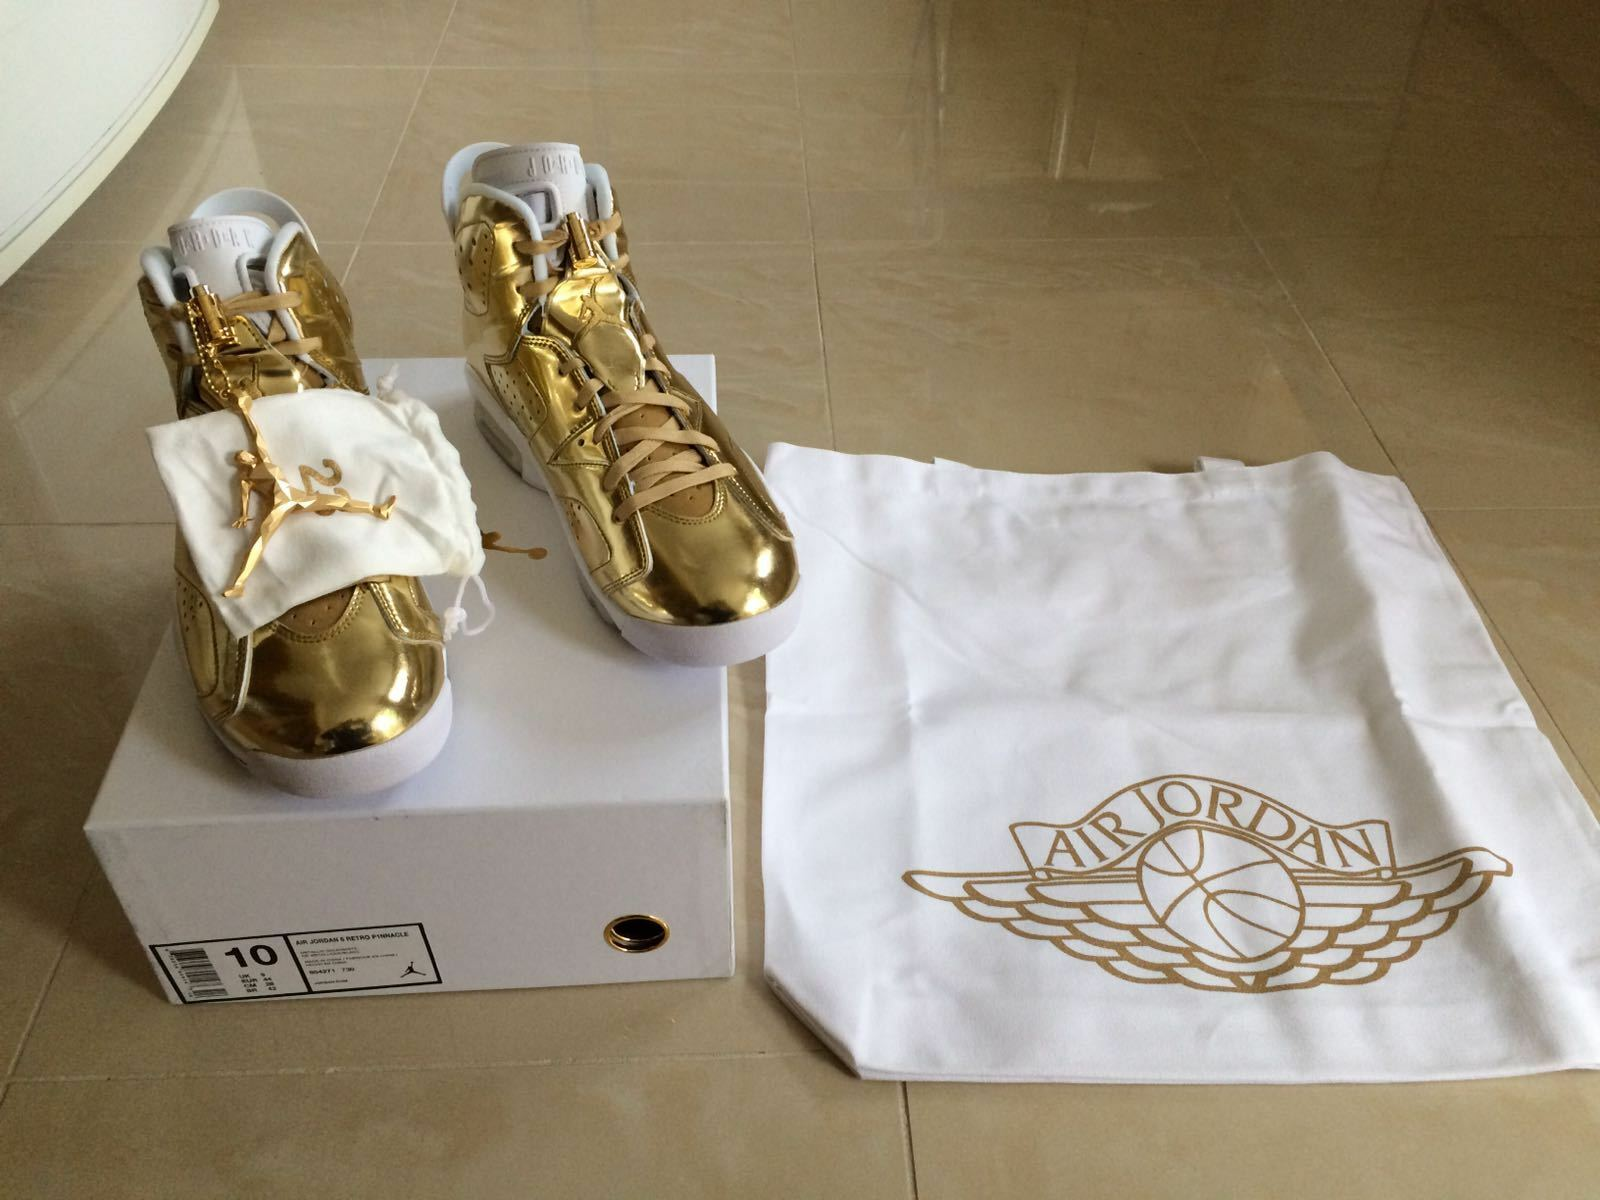 NIKE AIR pinnacle JORDAN 6 pinnacle AIR doré métallisé édition limitée taille new 8a091c